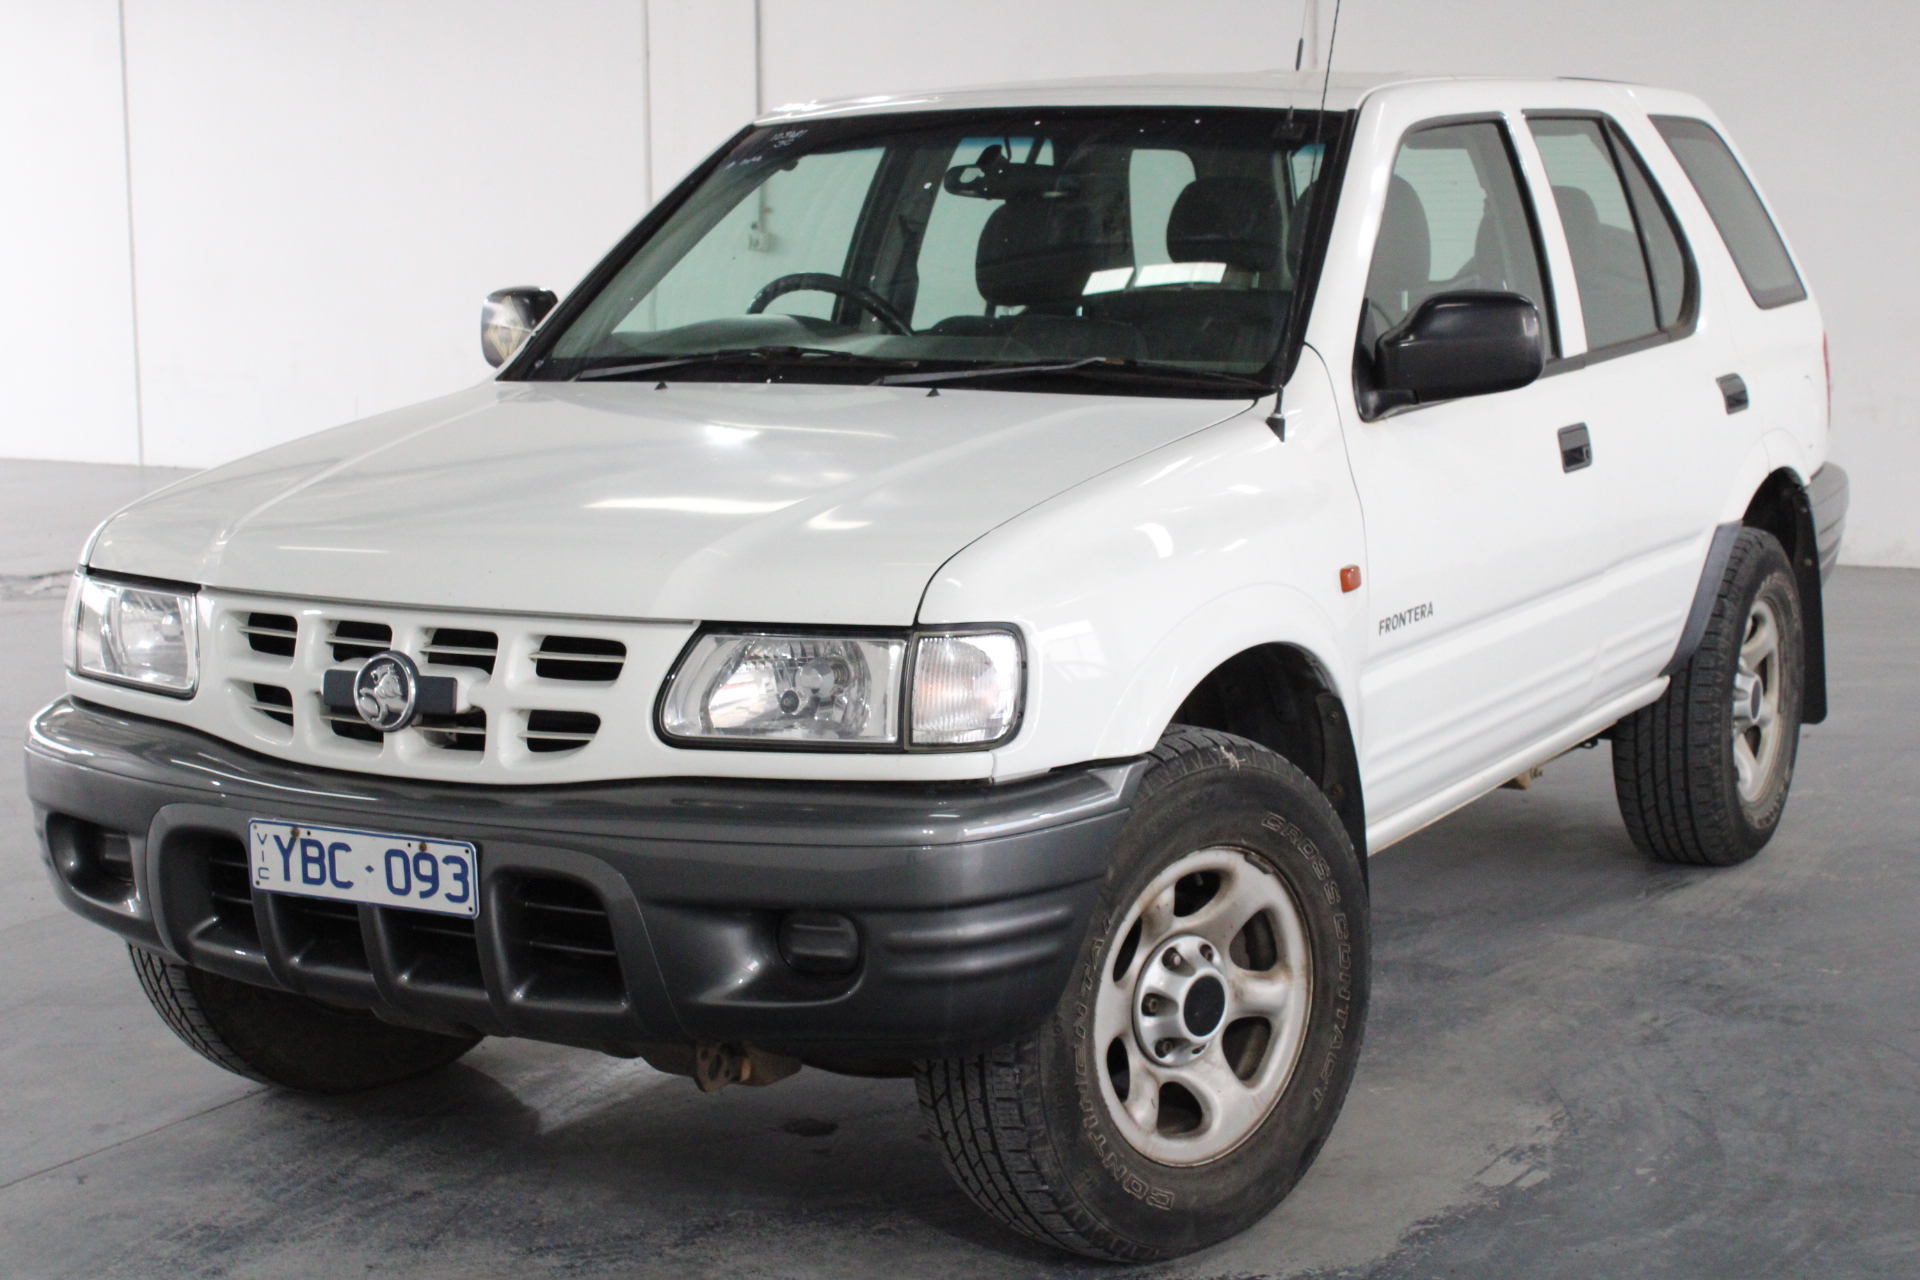 2002 Holden Frontera (4x4) Automatic Wagon